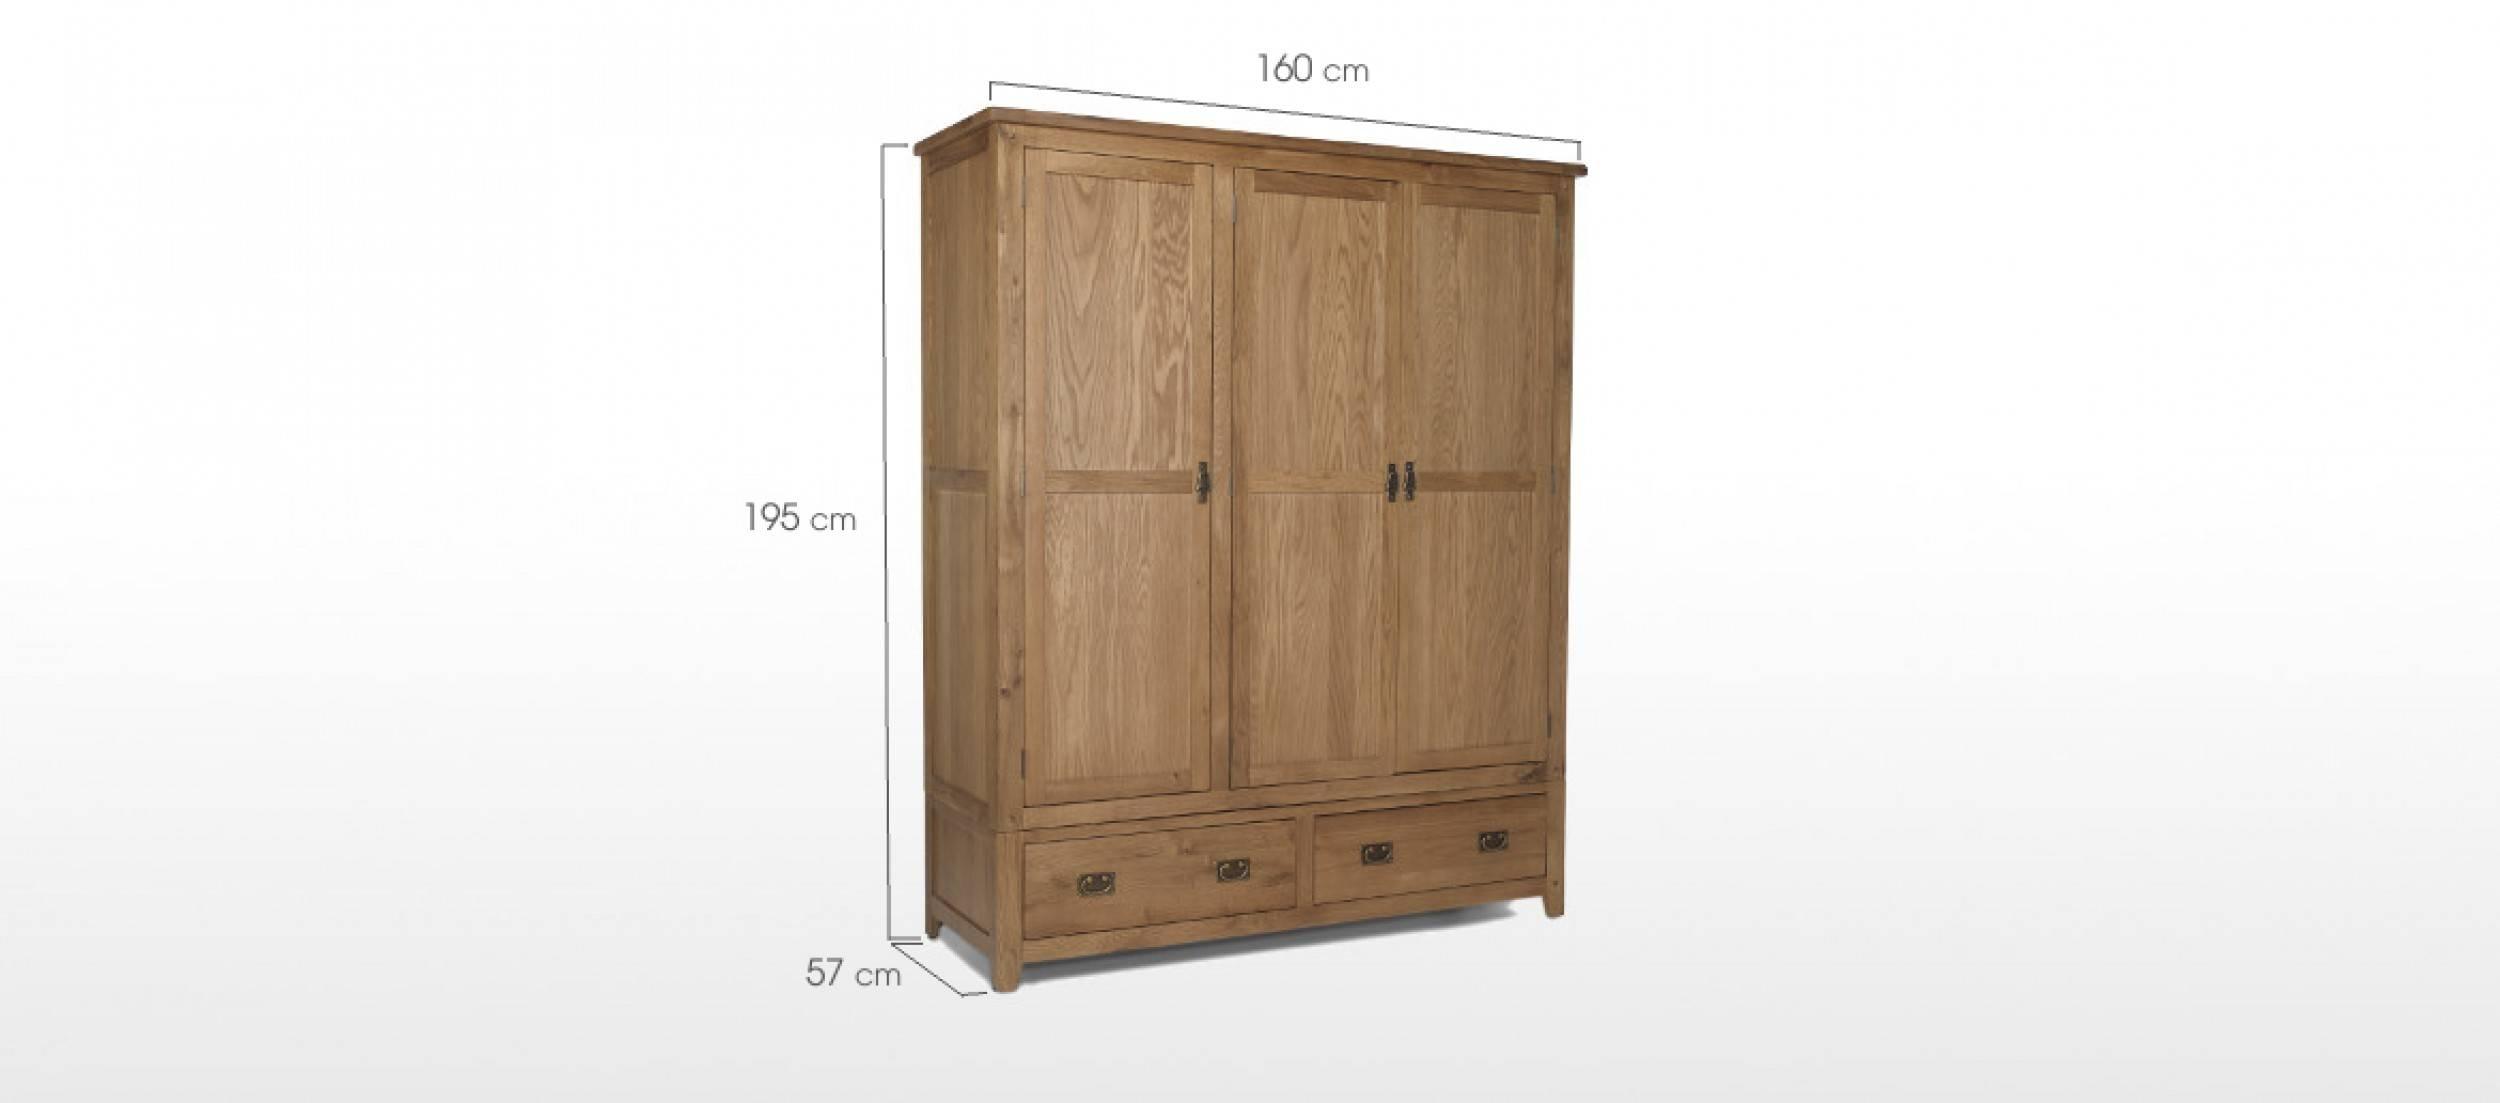 Rustic Oak Triple Wardrobe With Drawers | Quercus Living inside Triple Wardrobes With Drawers (Image 12 of 15)